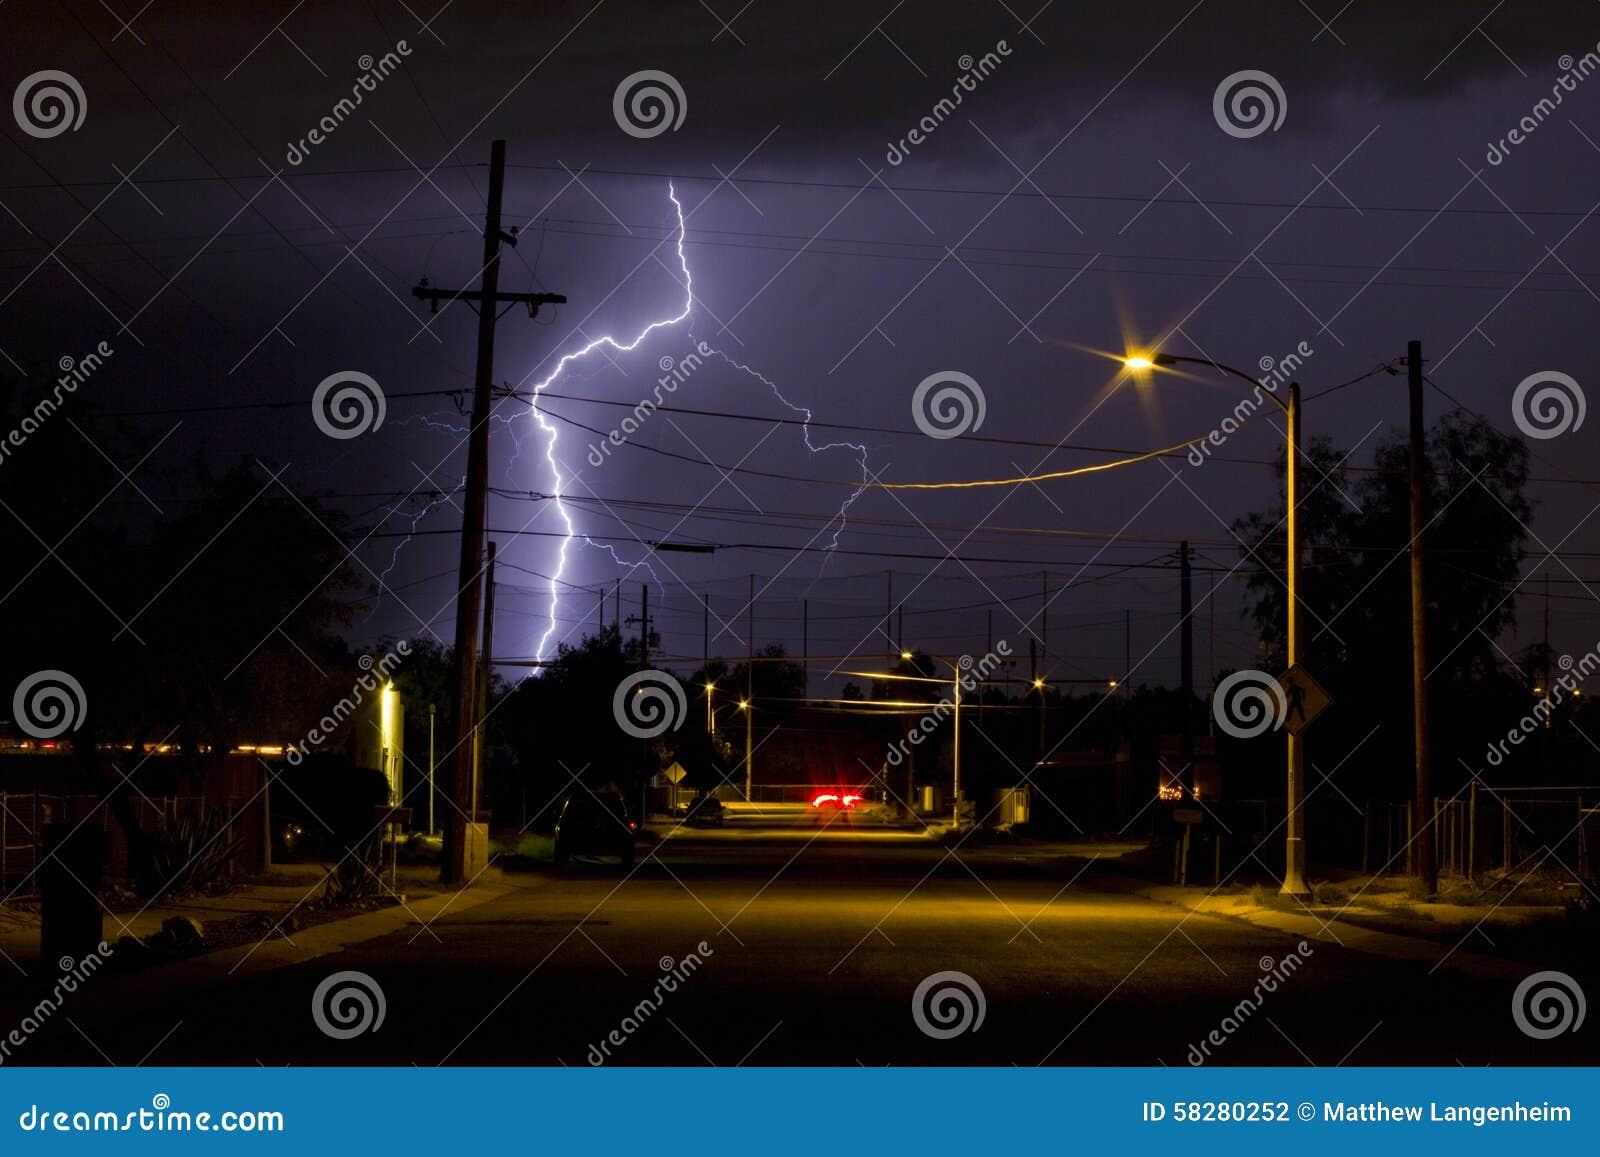 lightning in the barrio neighborhood in tucson arizona at night time